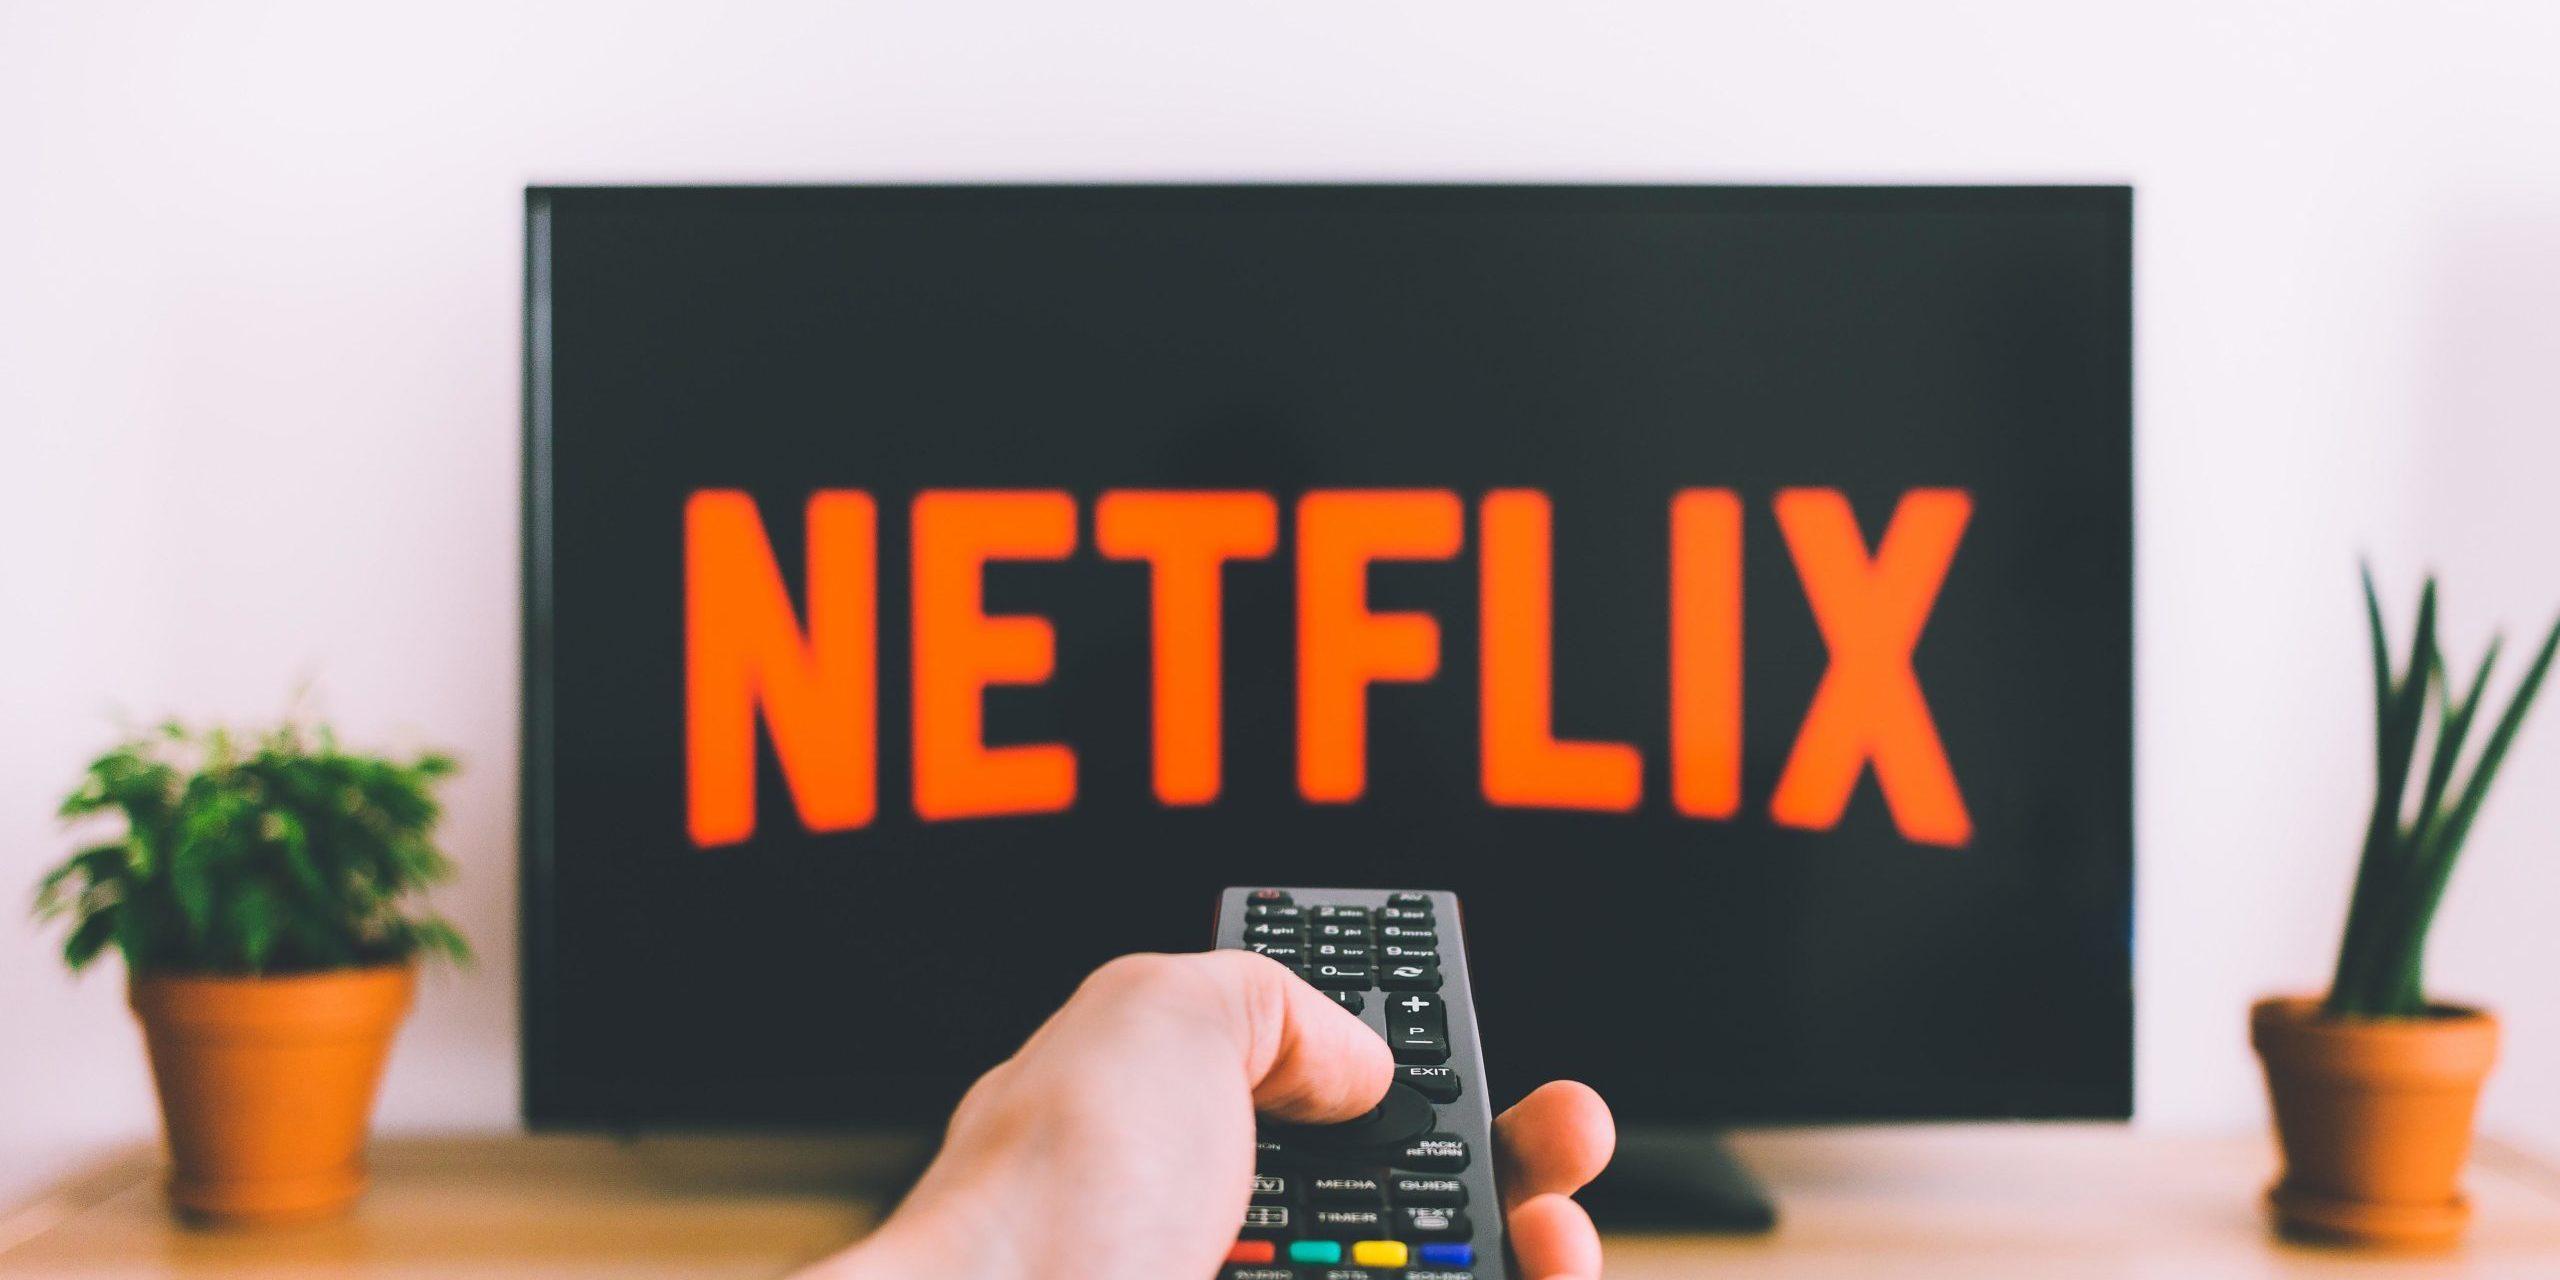 Future of Netflix